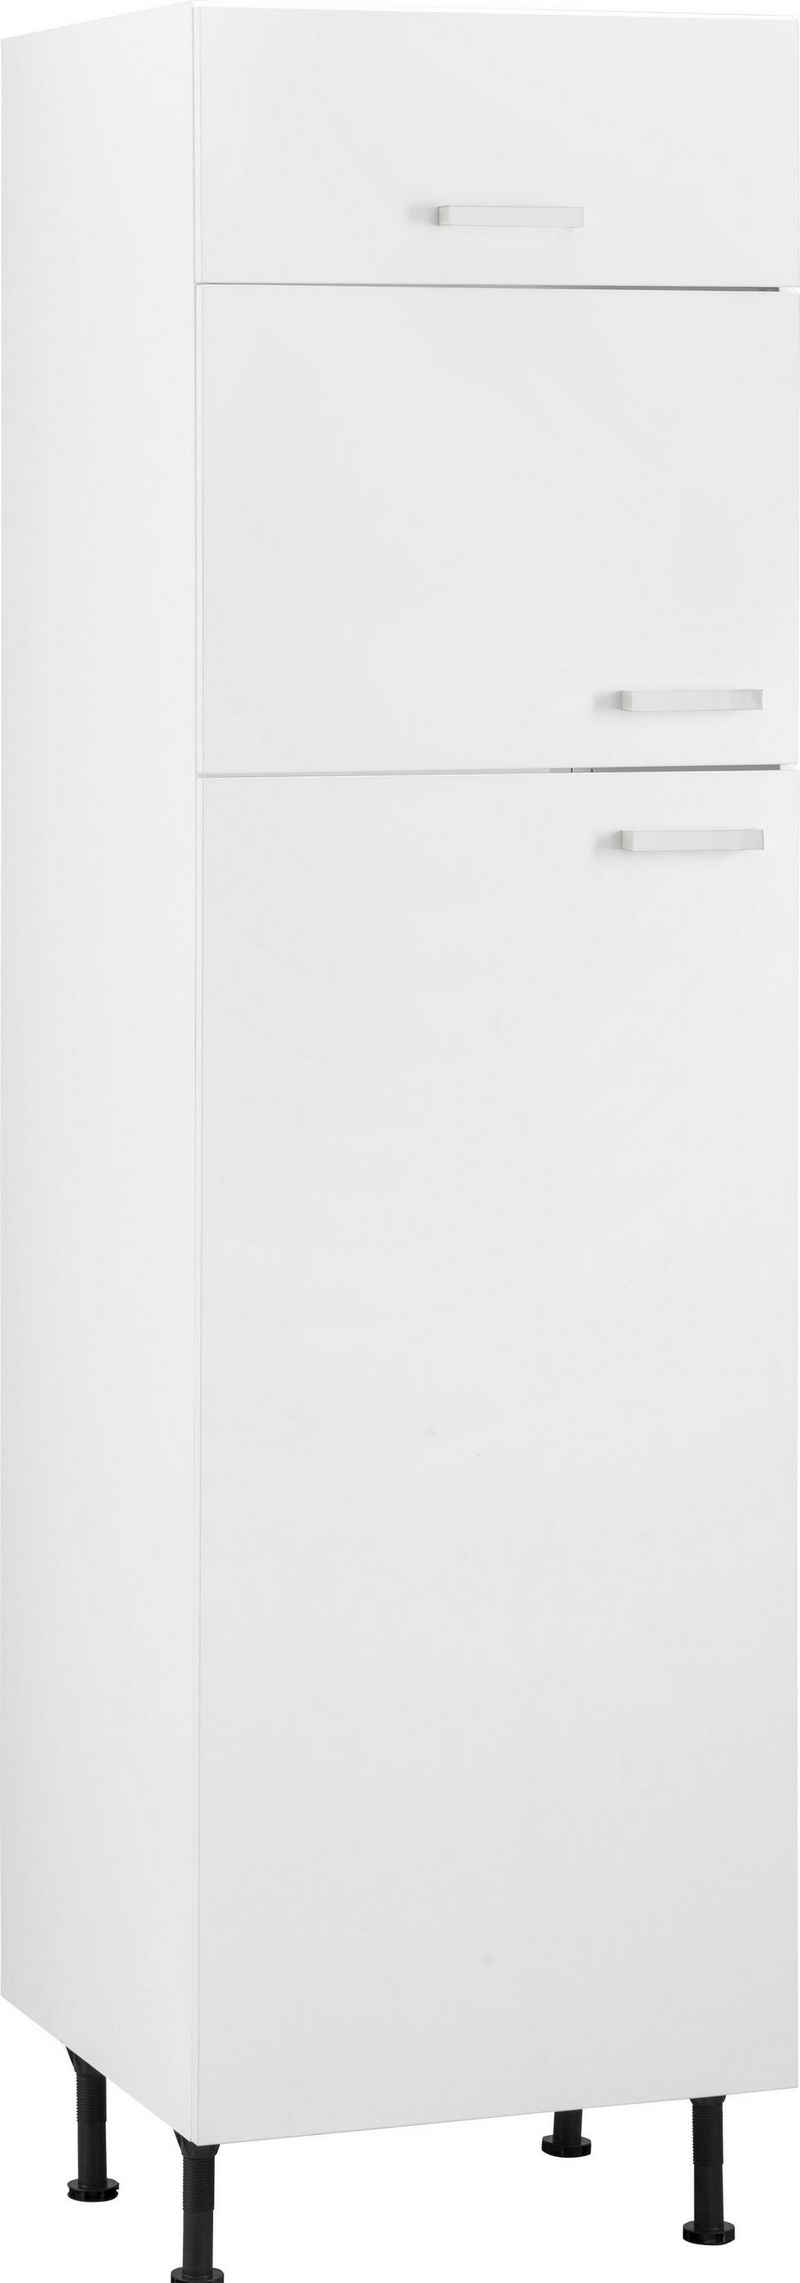 OPTIFIT Kühlumbauschrank »Parma« Breite 60 cm